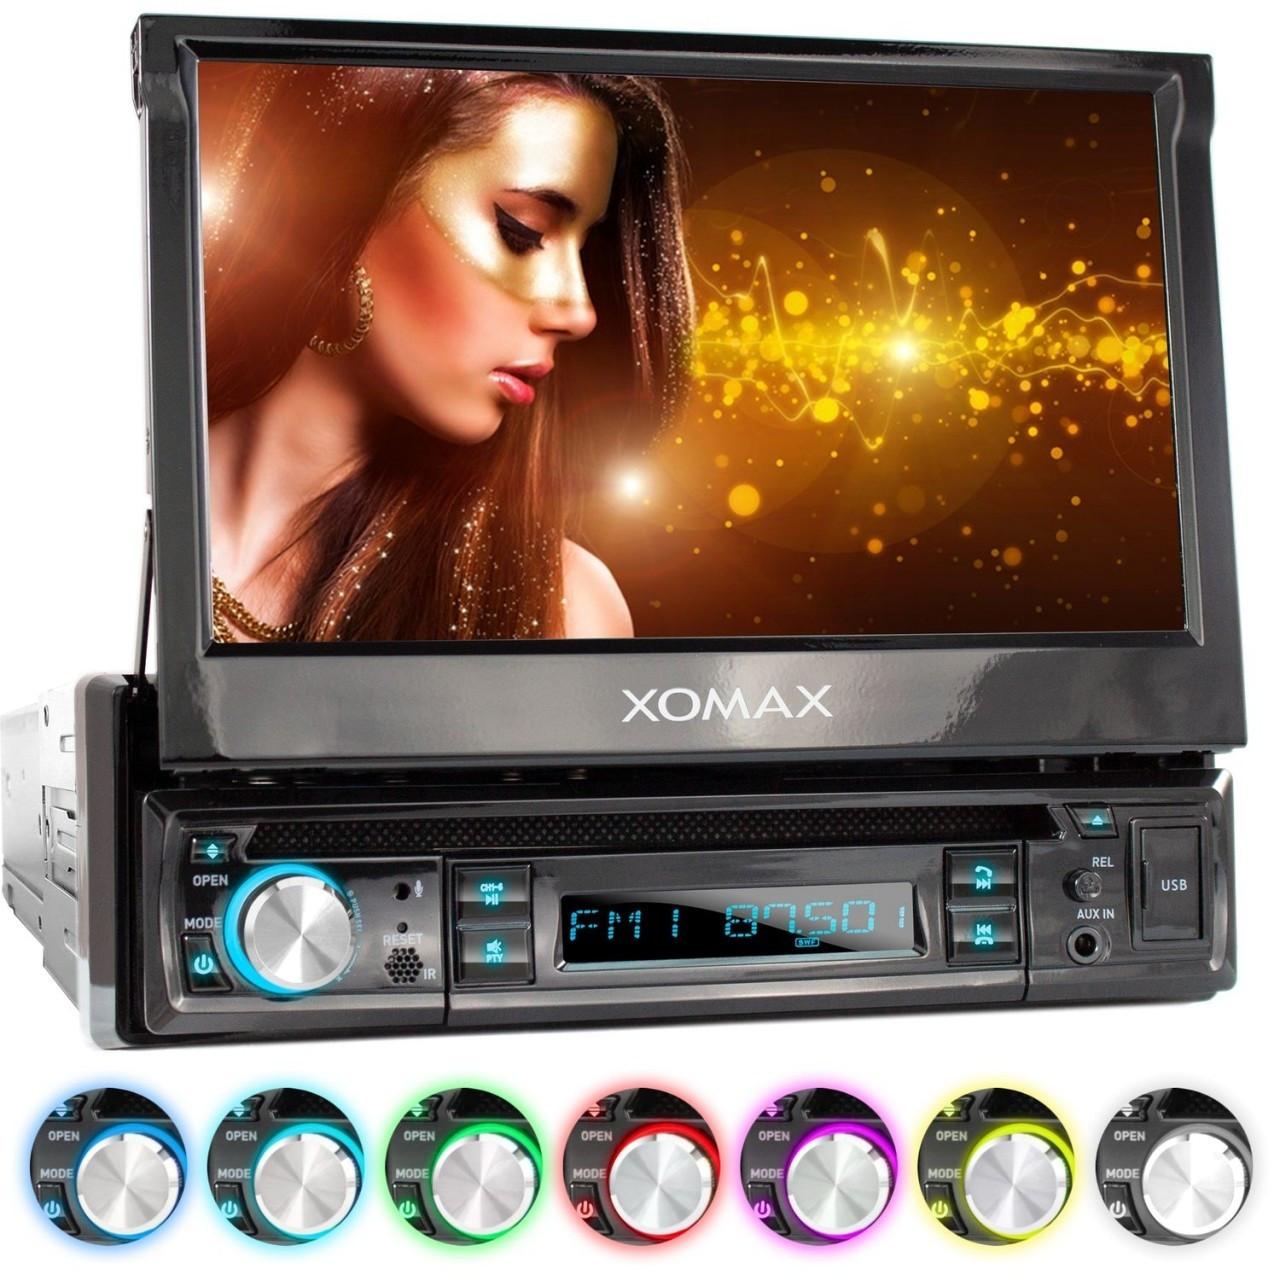 XOMAX XM-D749